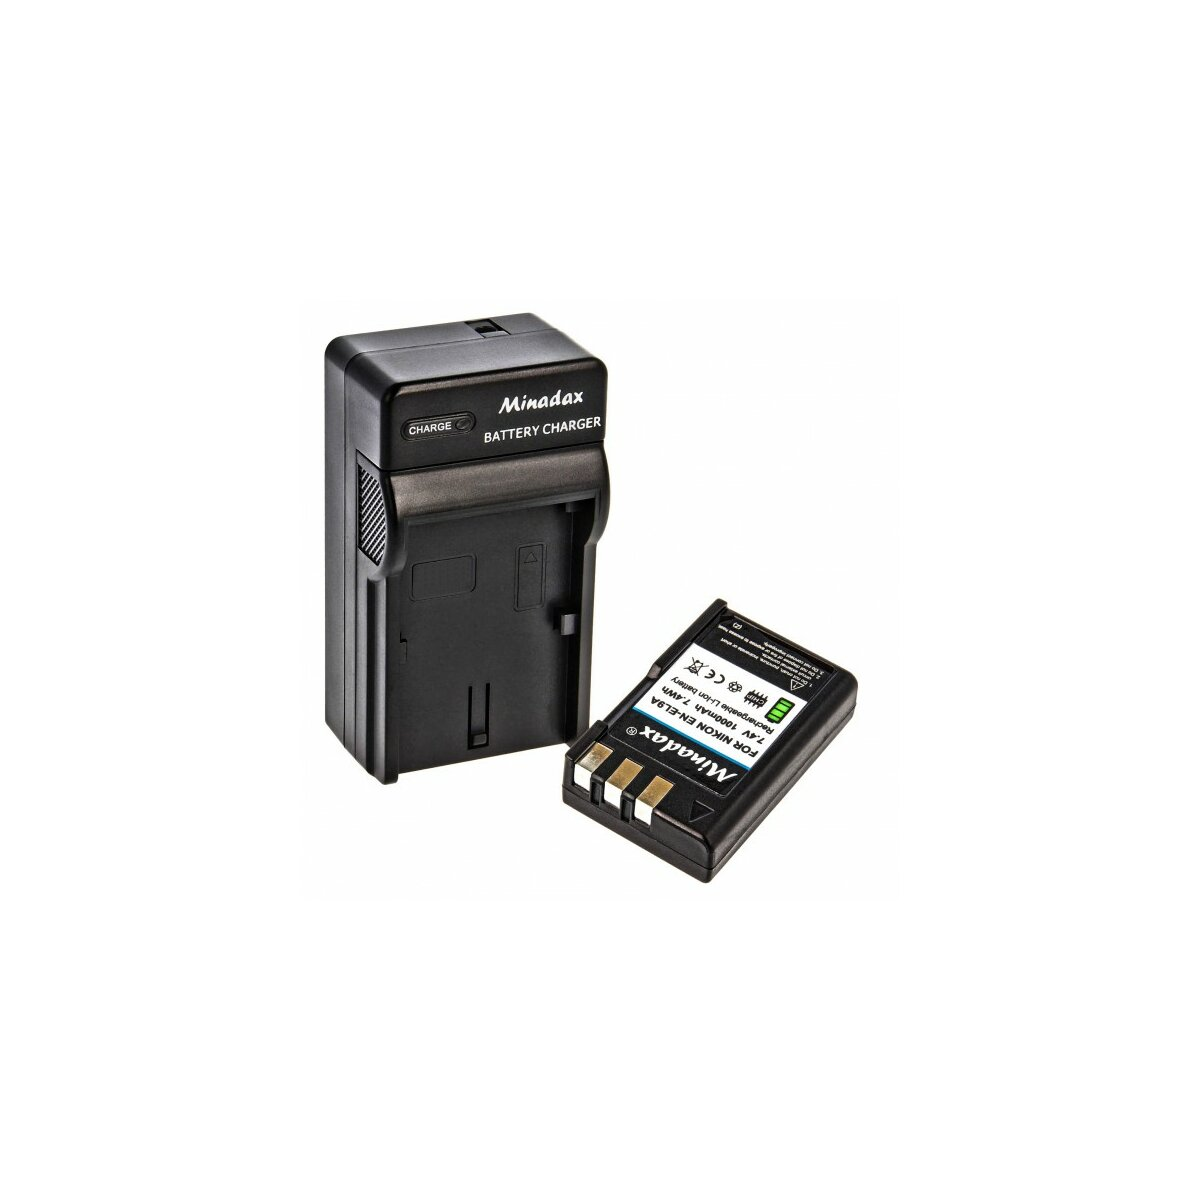 Minadax® Ladegerät 100% kompatibel mit Nikon EN-EL9a inkl. Auto Ladekabel, Ladeschale austauschbar + 1x Akku Ersatz für EN-EL9a